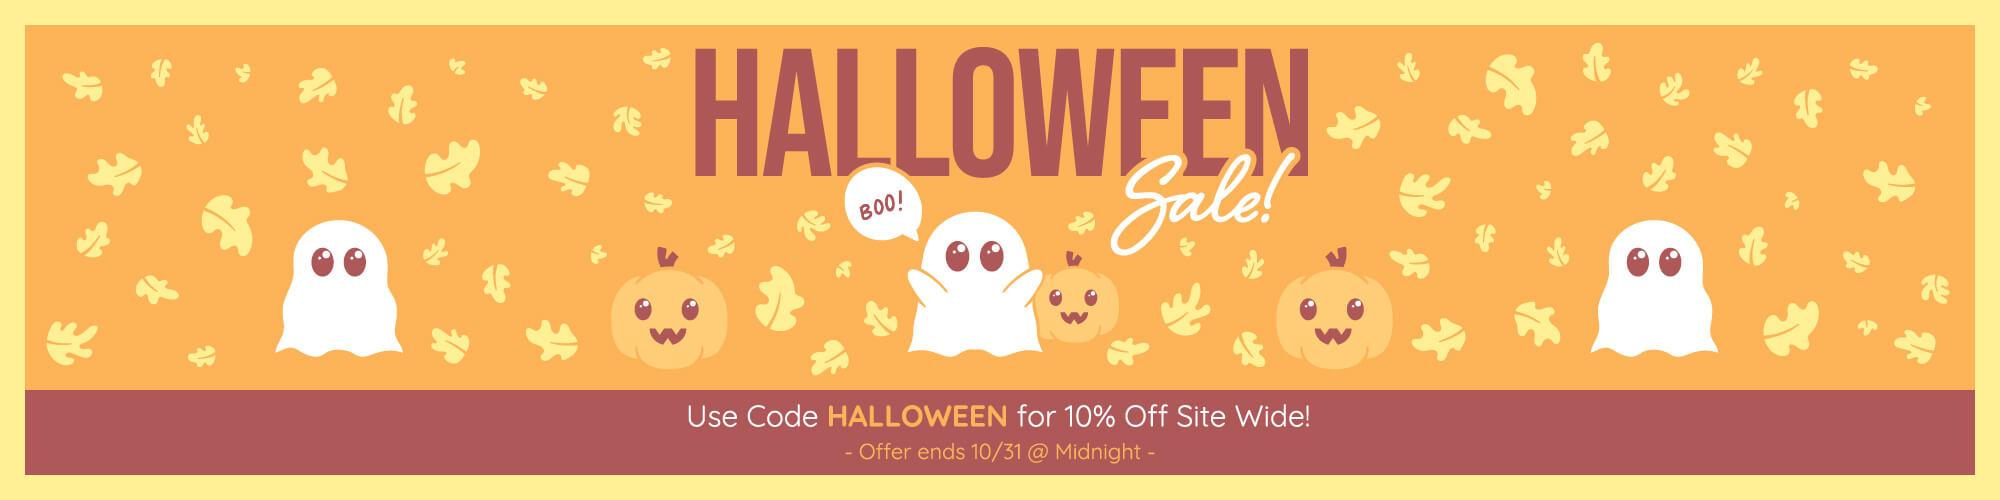 halloween-2021-sale-banner-ol-categorybanner.jpg